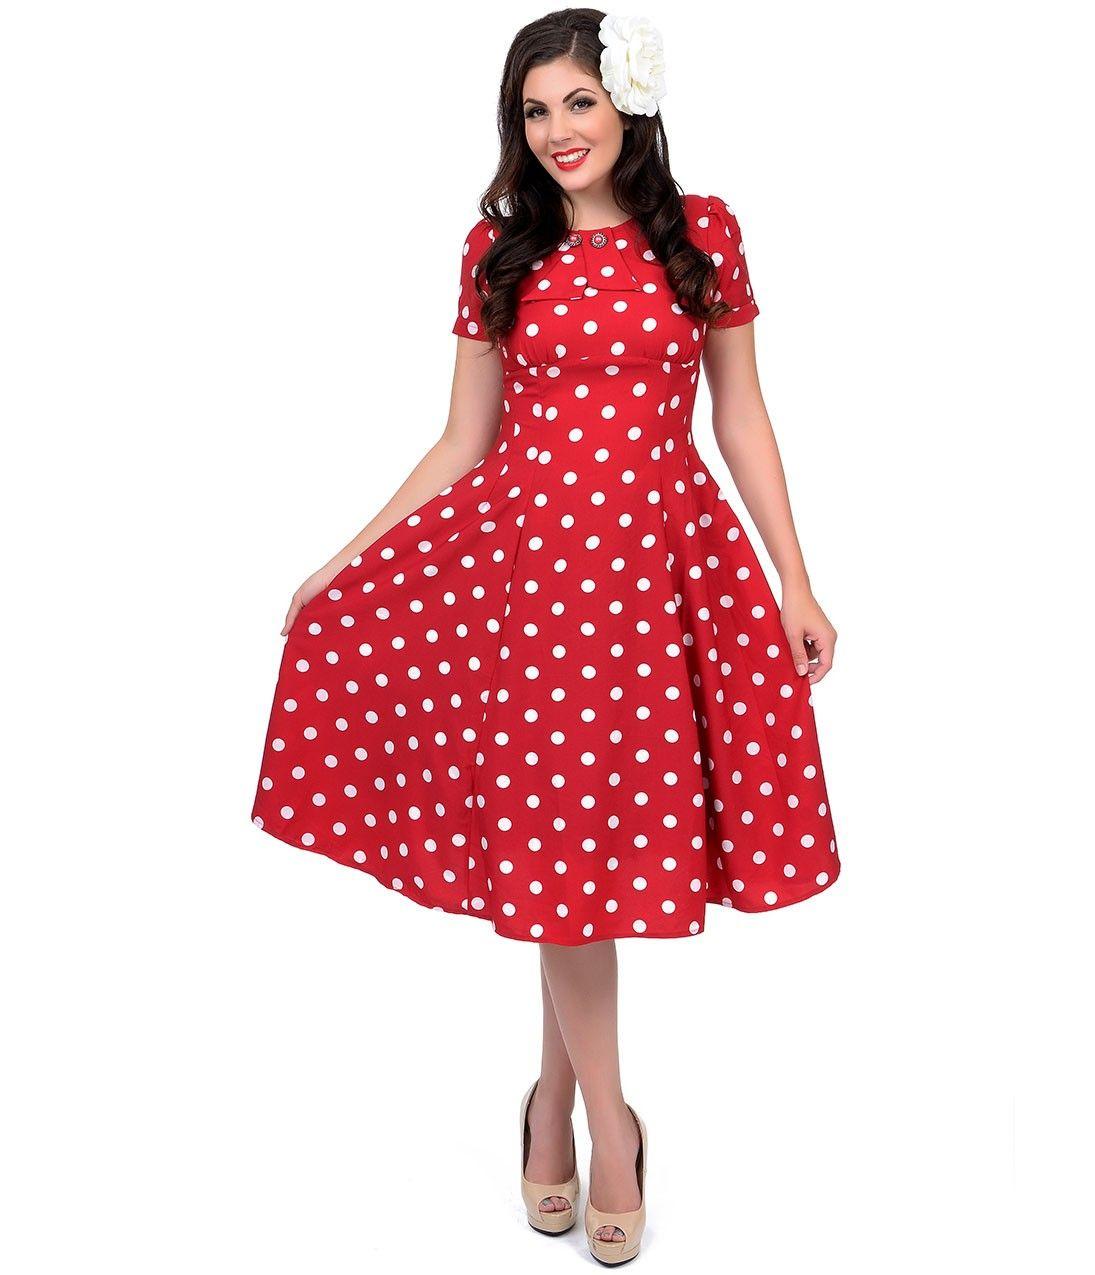 2c7cc130bd3d Ladies Marilyn 1950 s Rockabilly Polka Dot Retro Swing   Dress In Red only